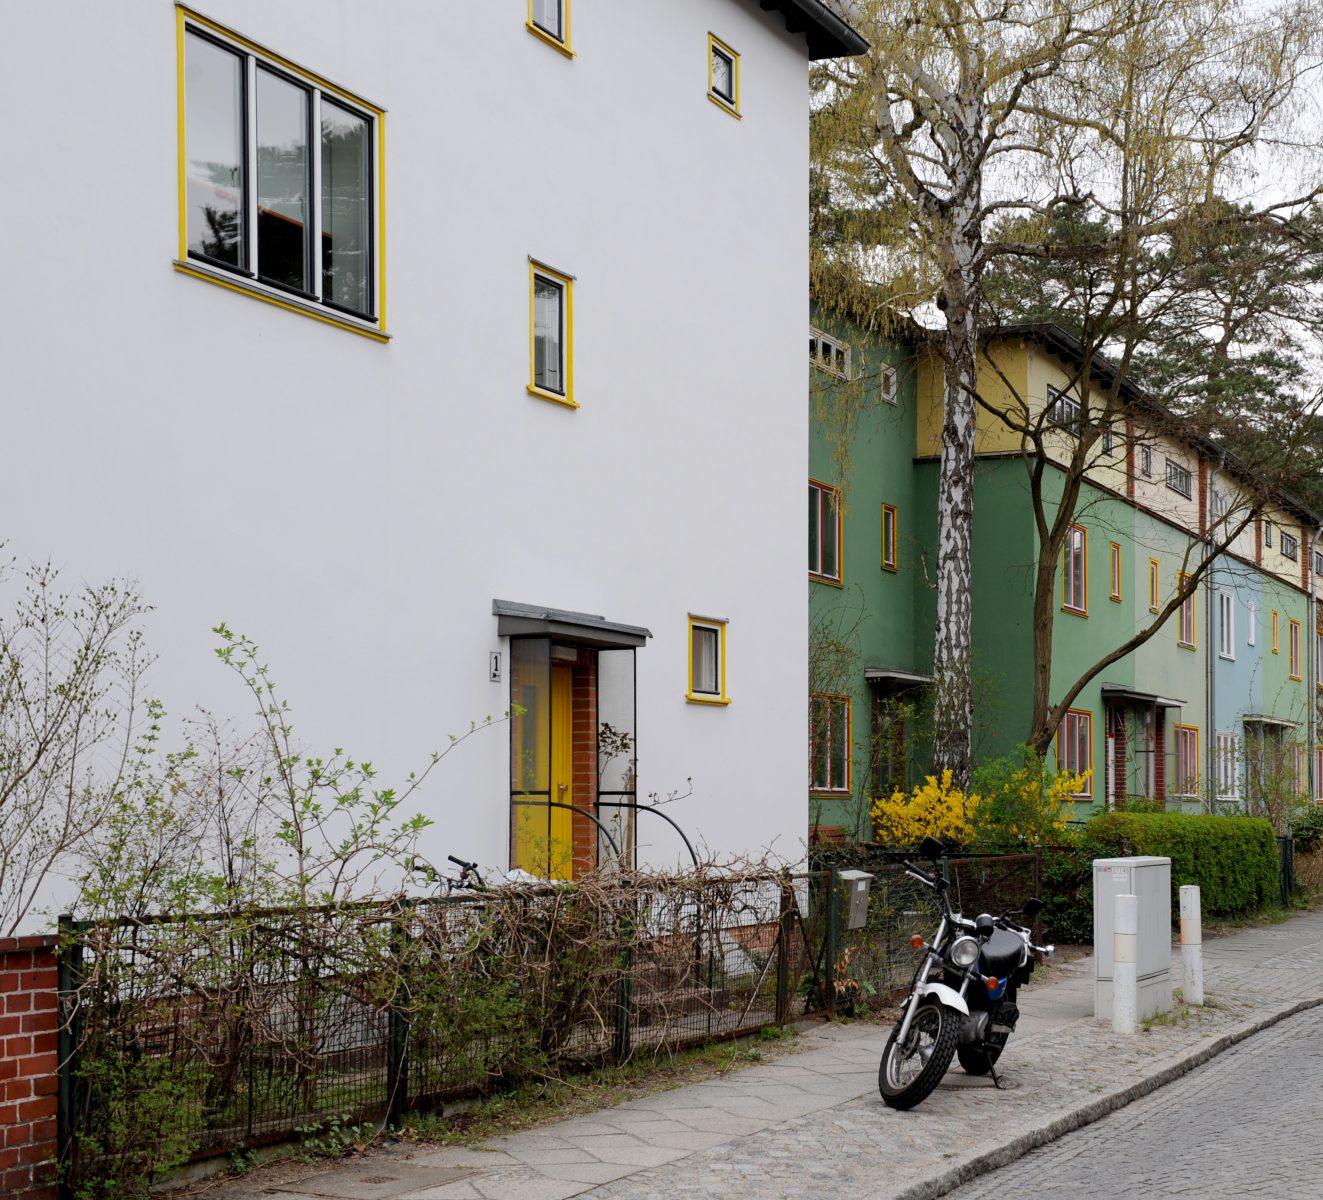 Onkel-Tom-Siedlung Berlin (Foto: Hilbich)